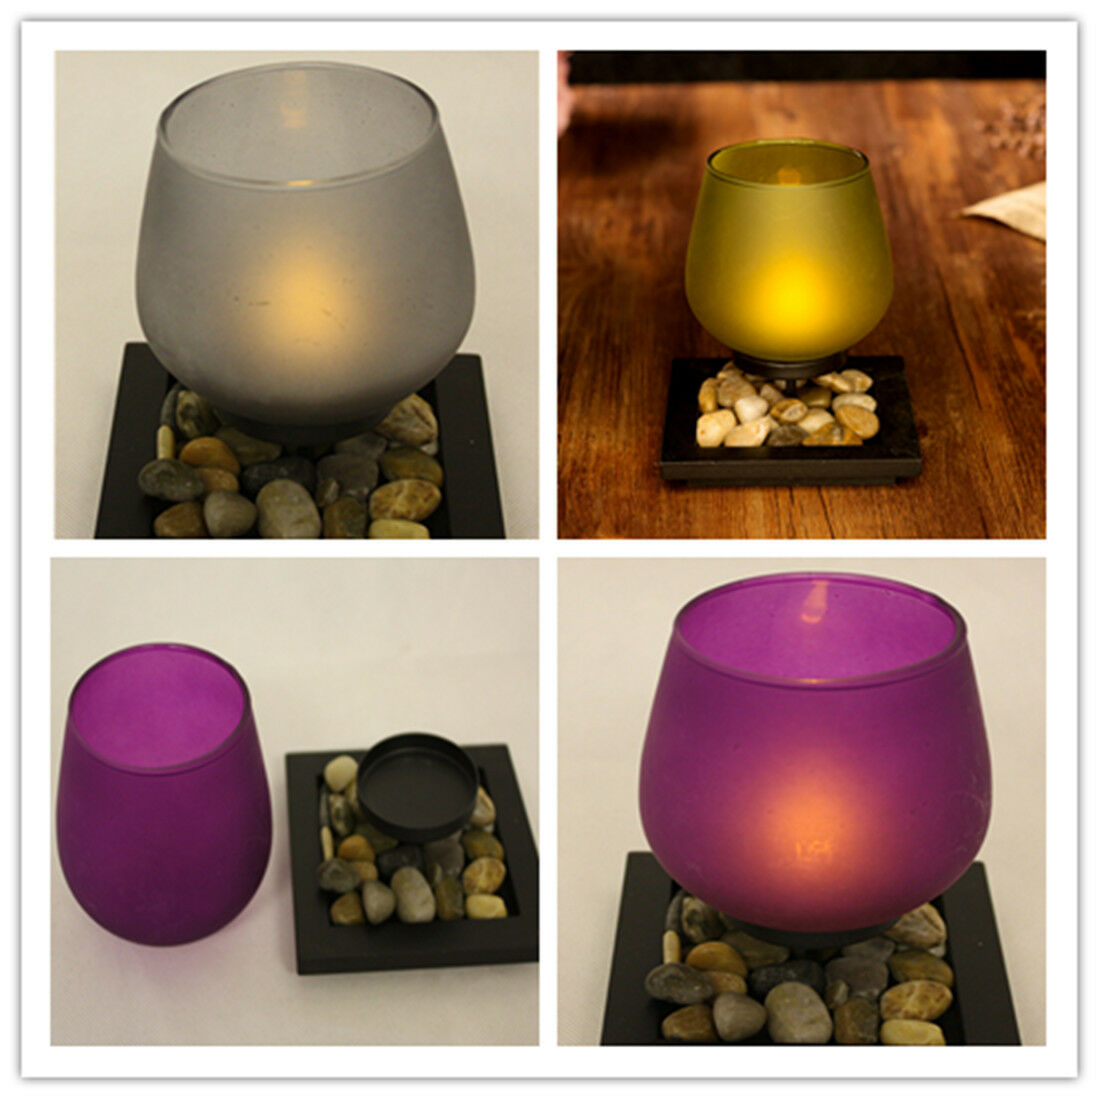 Tea Light Electric LED Candle Holder set 3 Lamp Christmas We